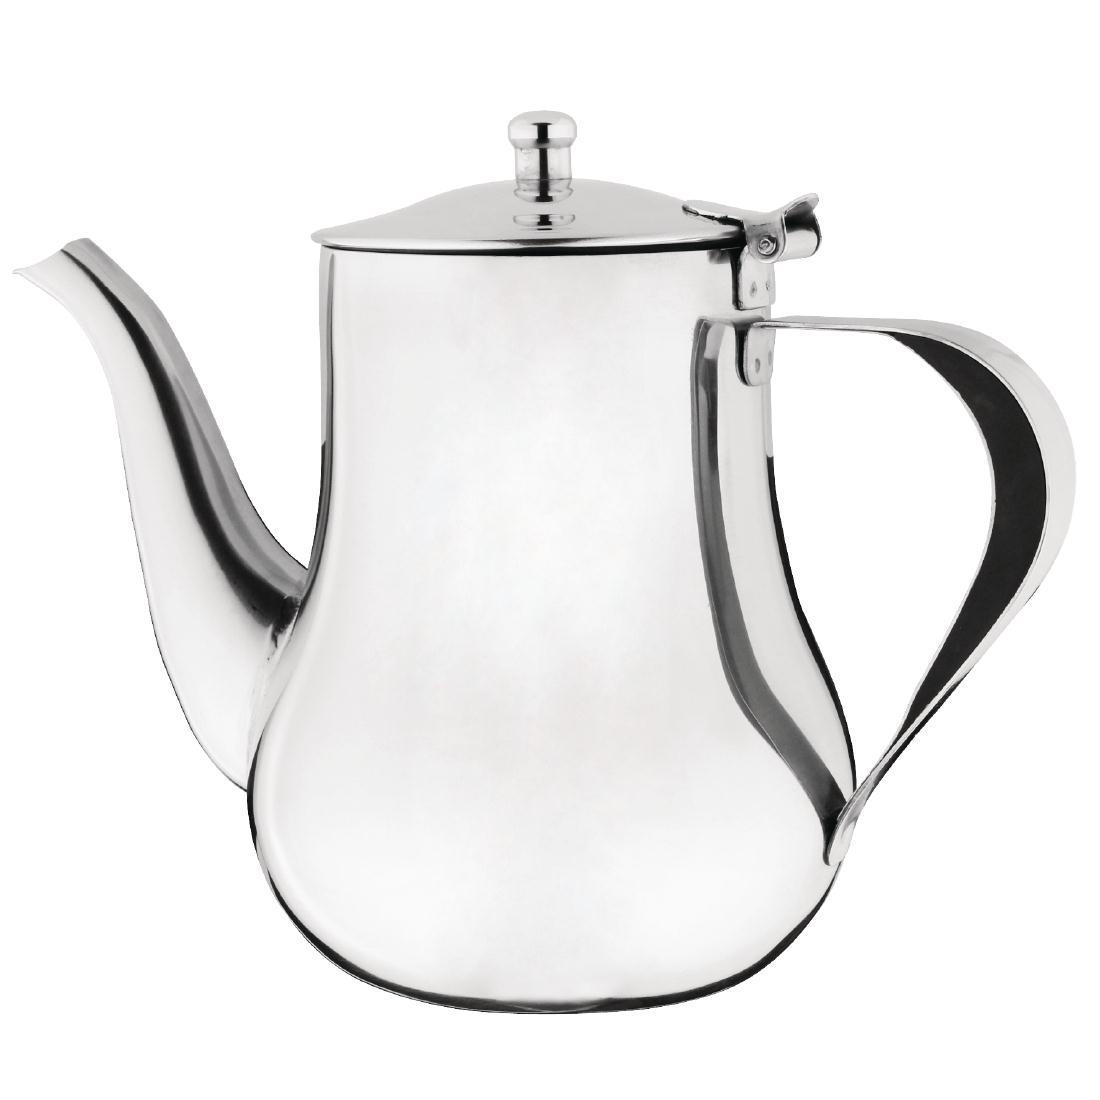 Cafetière marocaine acier inoxydable 1L